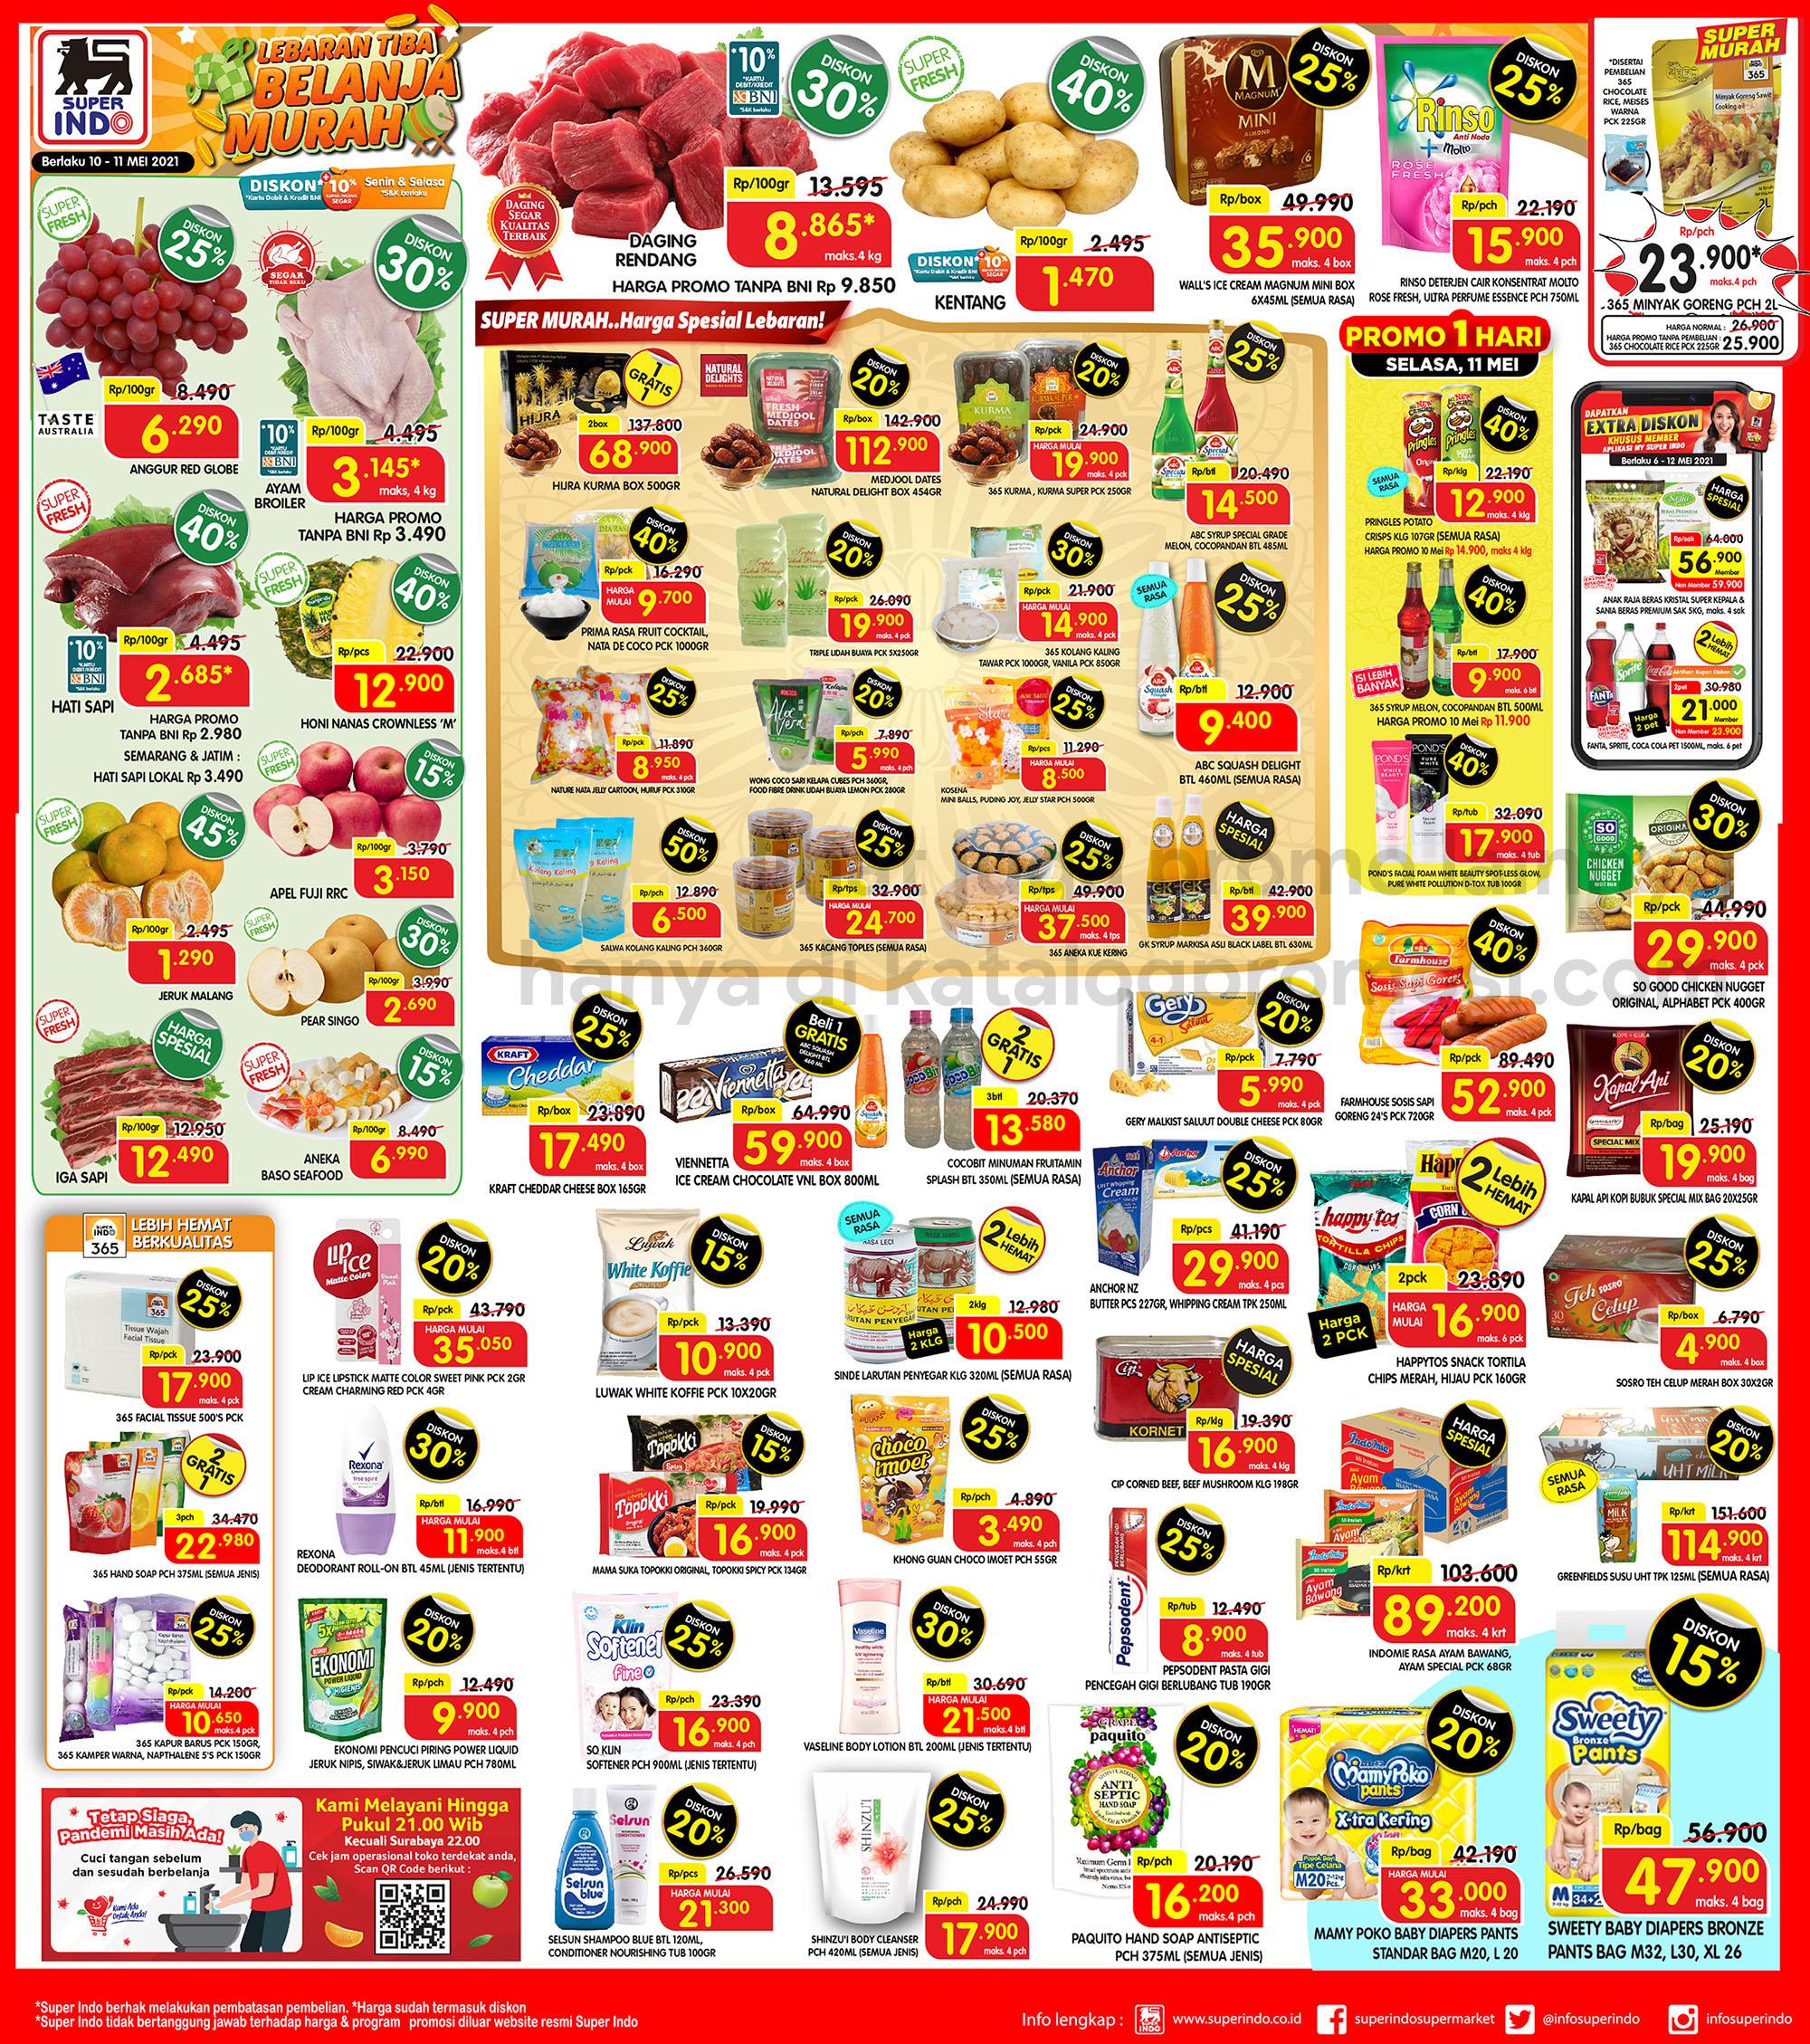 Promo Superindo Katalog Awal Pekan (Weekday) periode 10-11 Mei 2021